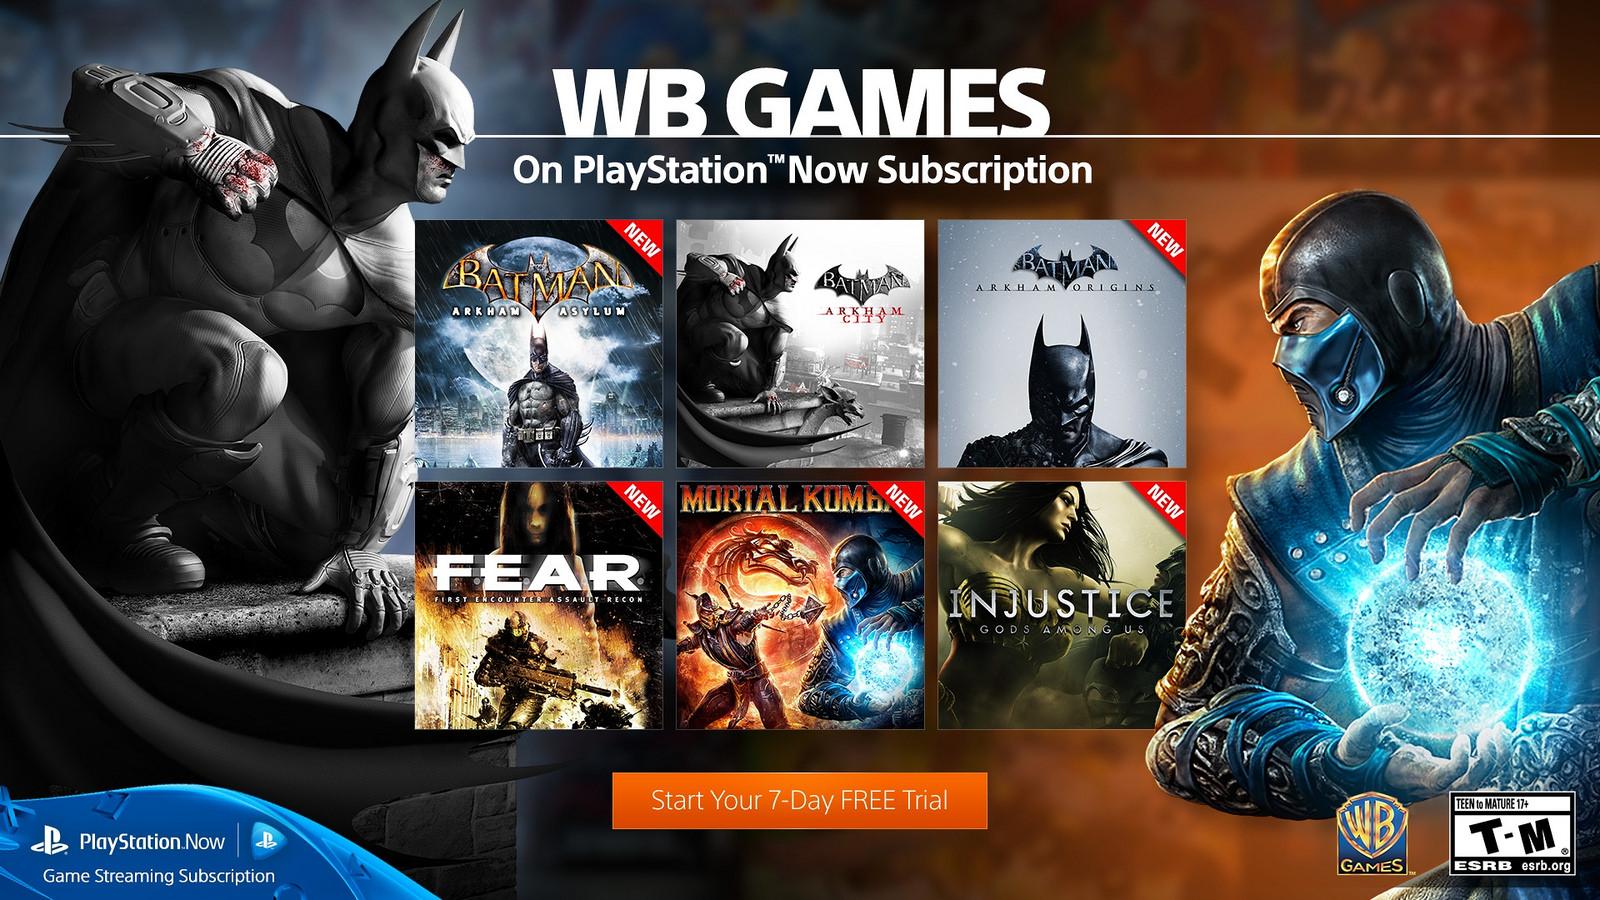 Batman Mortal Kombat LEGO Games Coming To PlayStation Now Next Week VG247